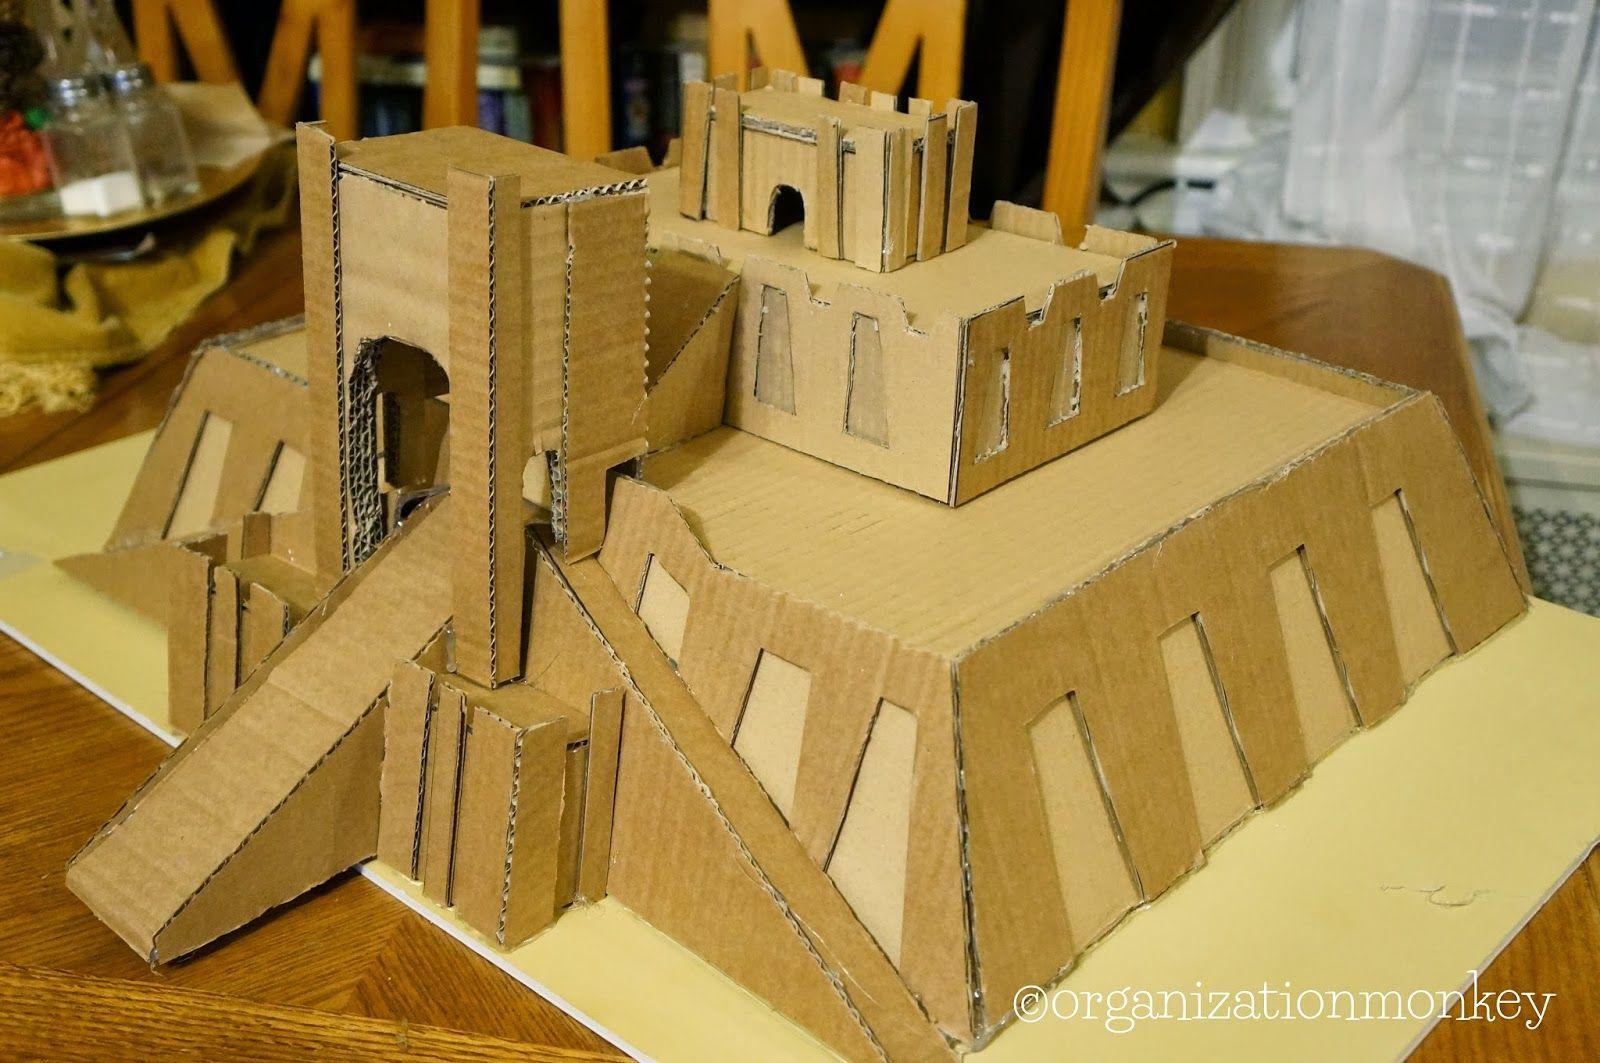 Ziggurat of Ur School Projects = Disorganization | School projects ...